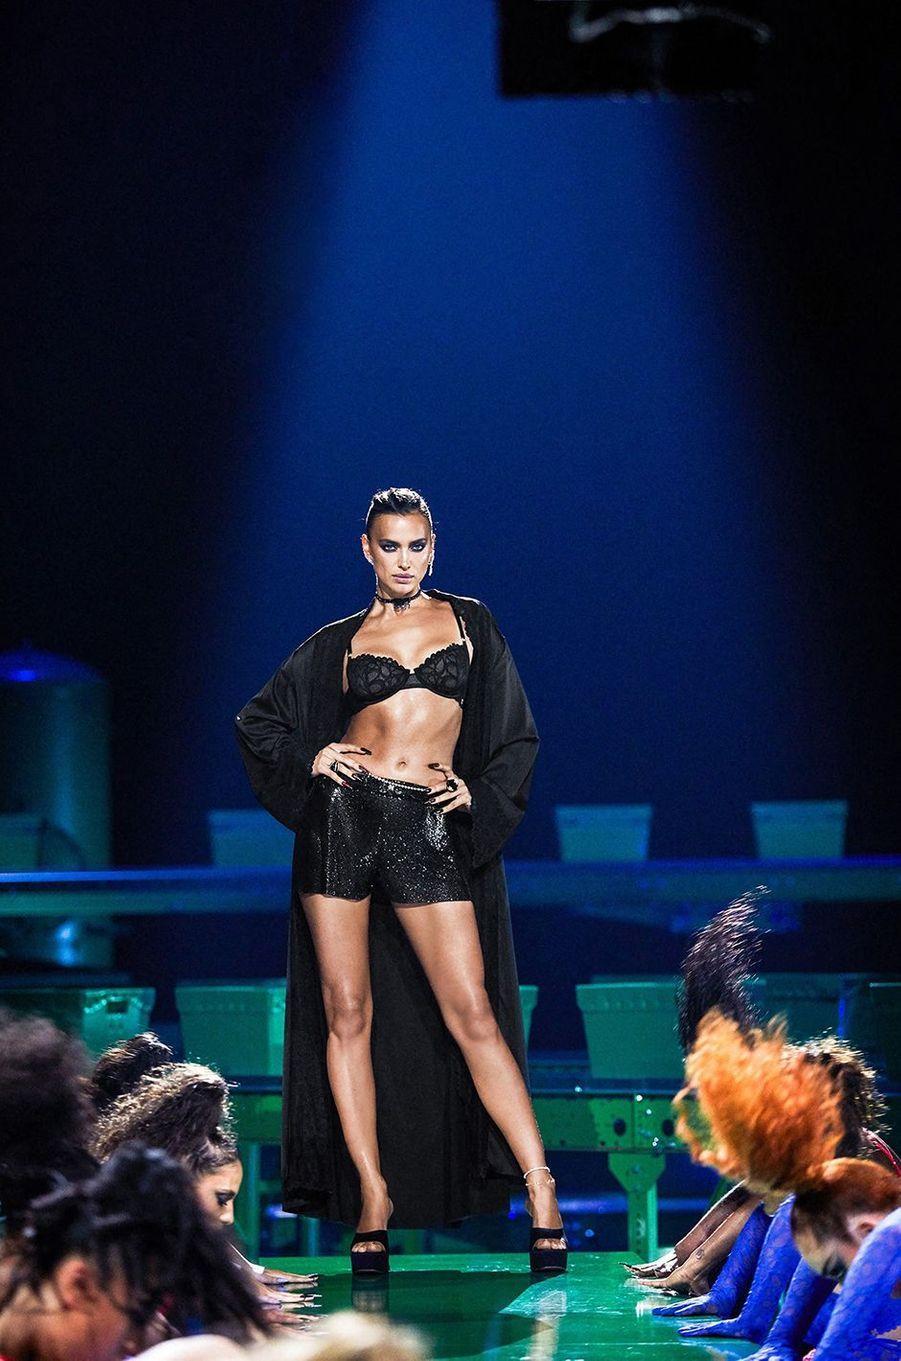 Irina Shaykdéfile pour la marque de lingerie de Rihanna Savage x Fenty, octobre 2020